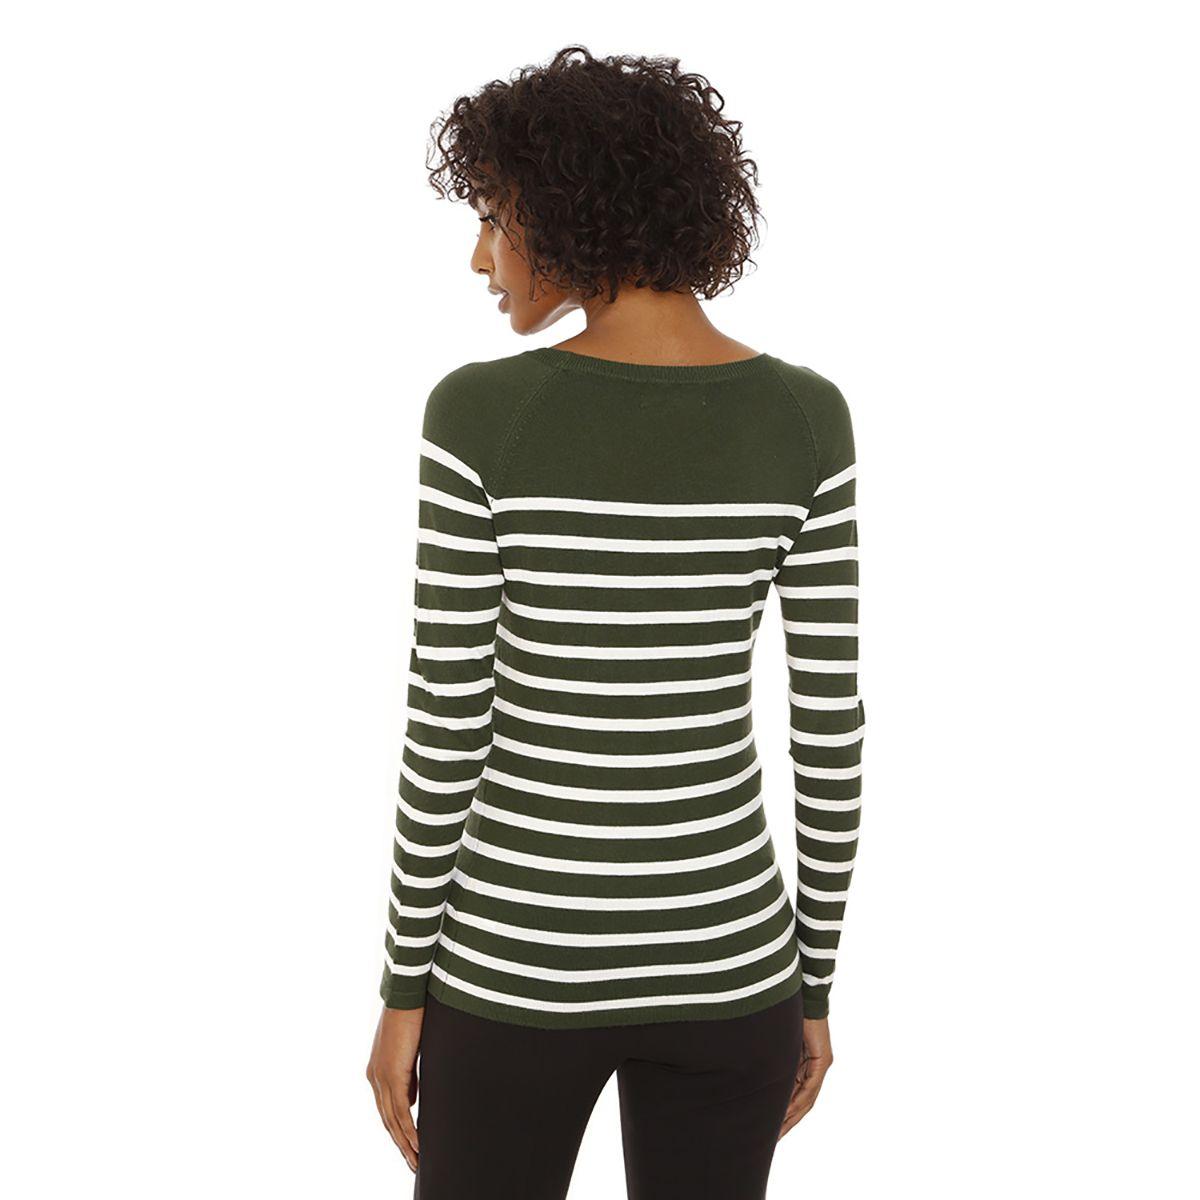 Blusa-Listrada-Tricot-Verde